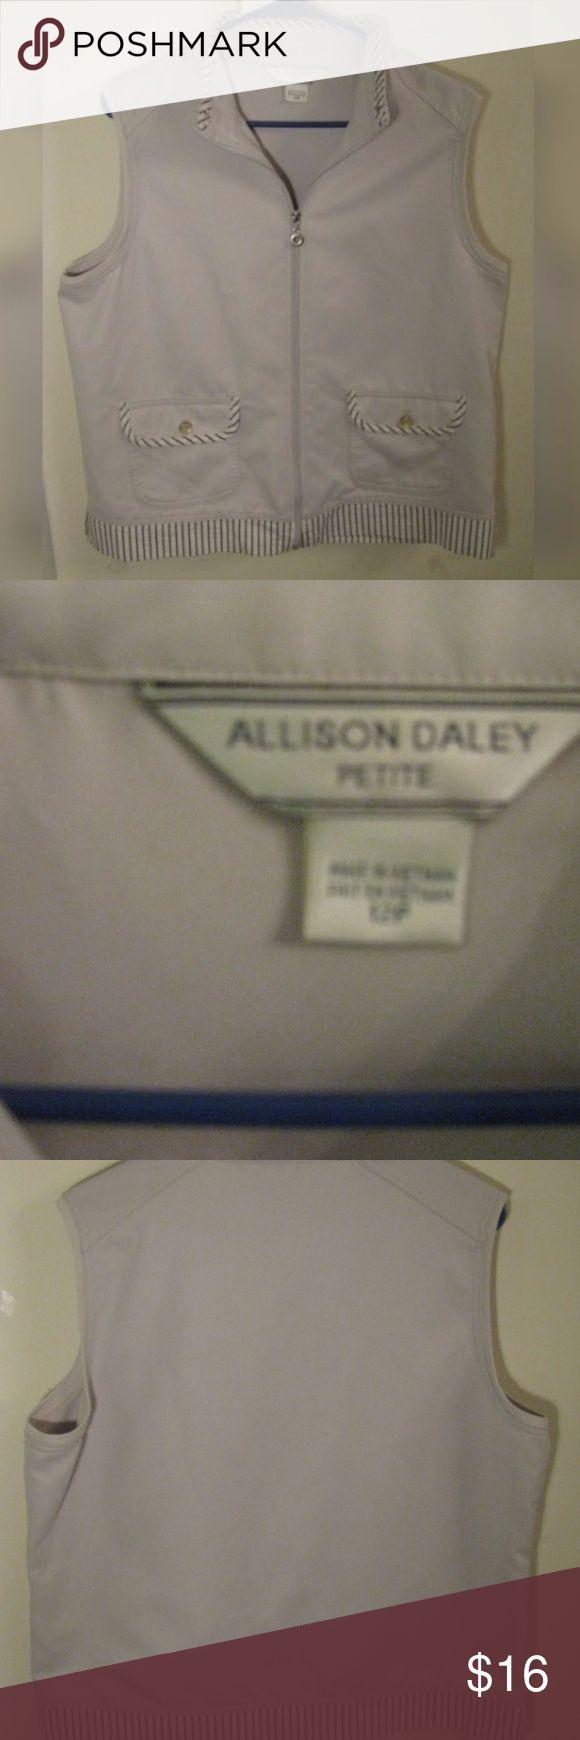 Allison Daley Petite Vest Allison Daley Petite Vest Great conditon Allison Daley Jackets & Coats Vests